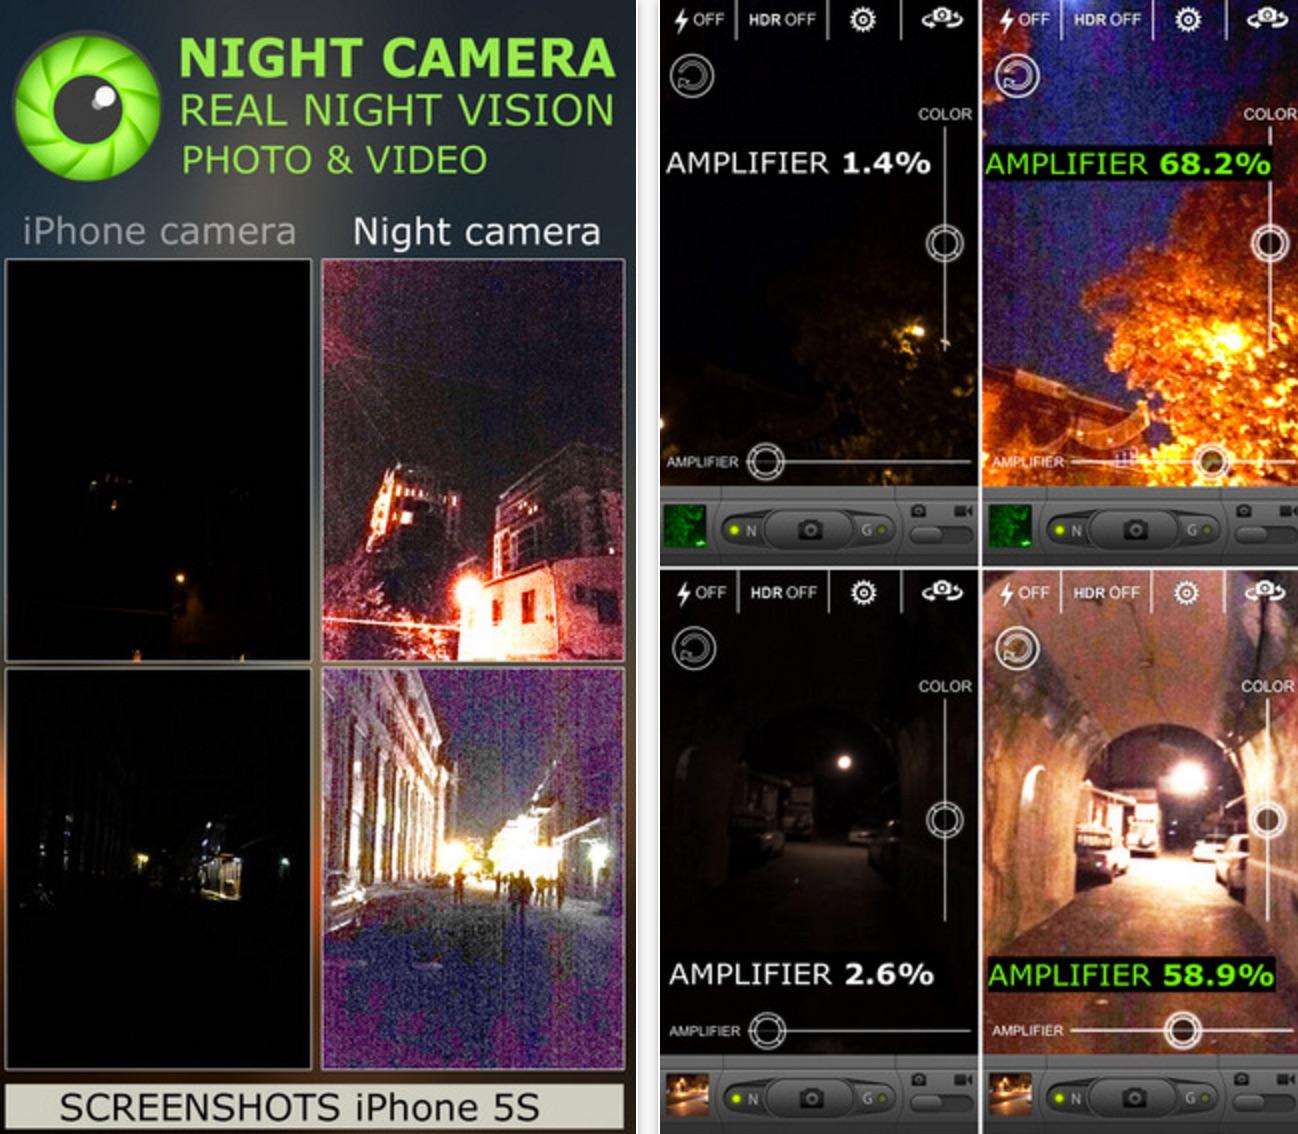 Night Vision Camera slow shutter HD